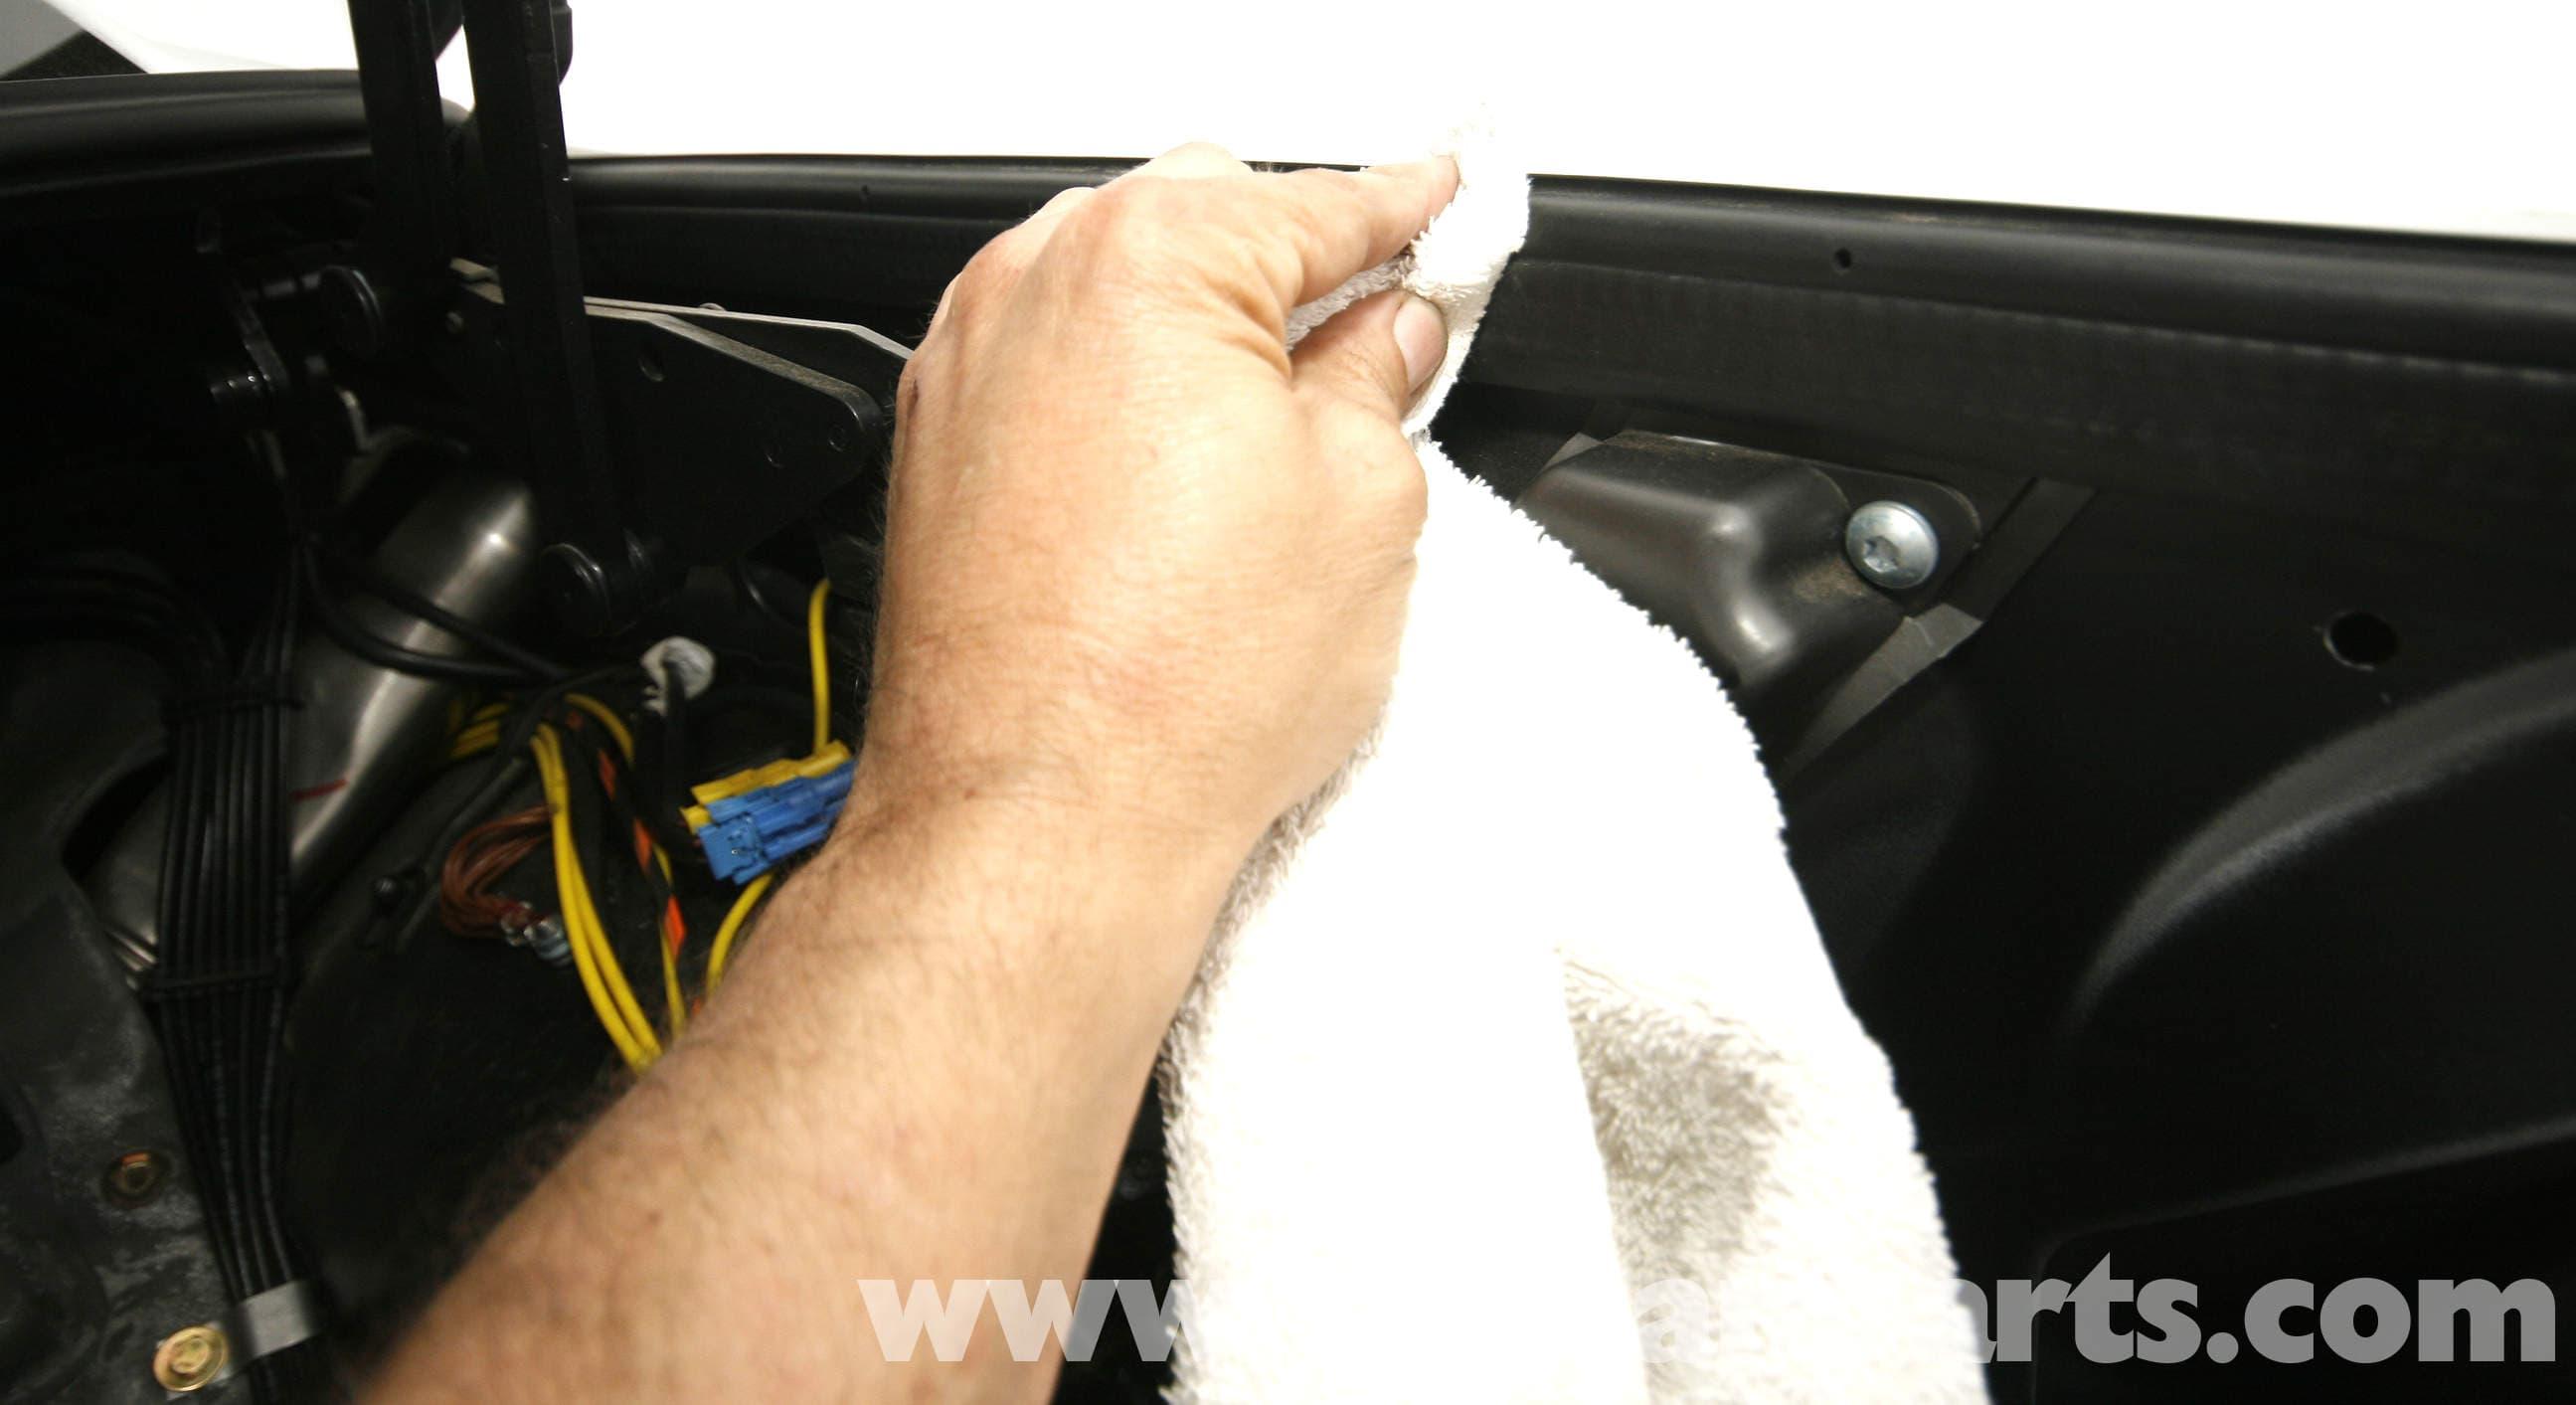 Mercedes Benz Slk 230 Vario Top Hydraulic Pump Service 1998 2004 Auto Off Com Wiring Diagram Large Image Extra